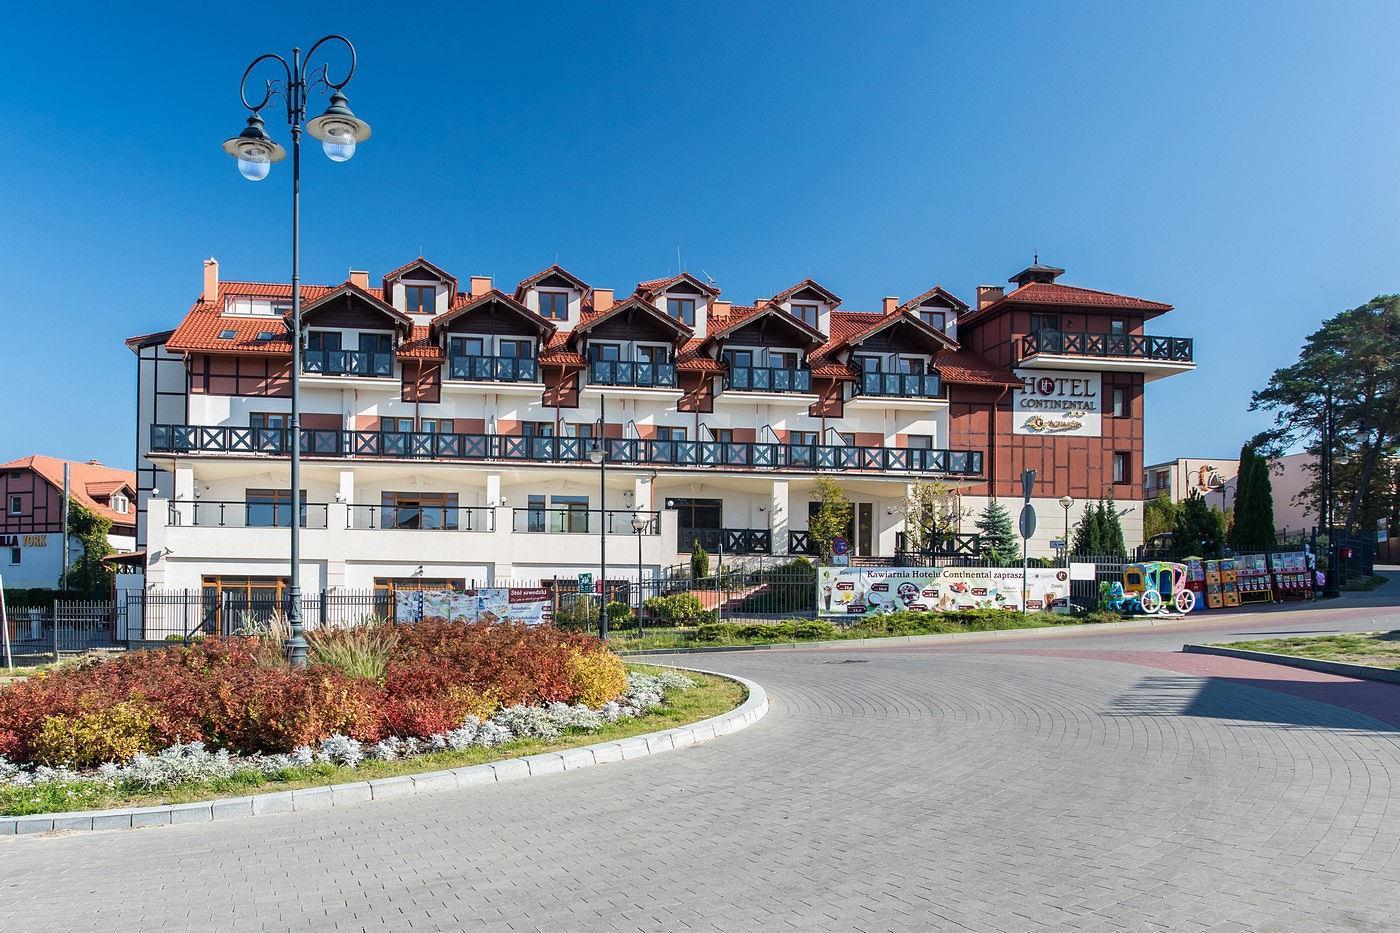 KRYNICA MORSKA HOTEL CONTINENTAL